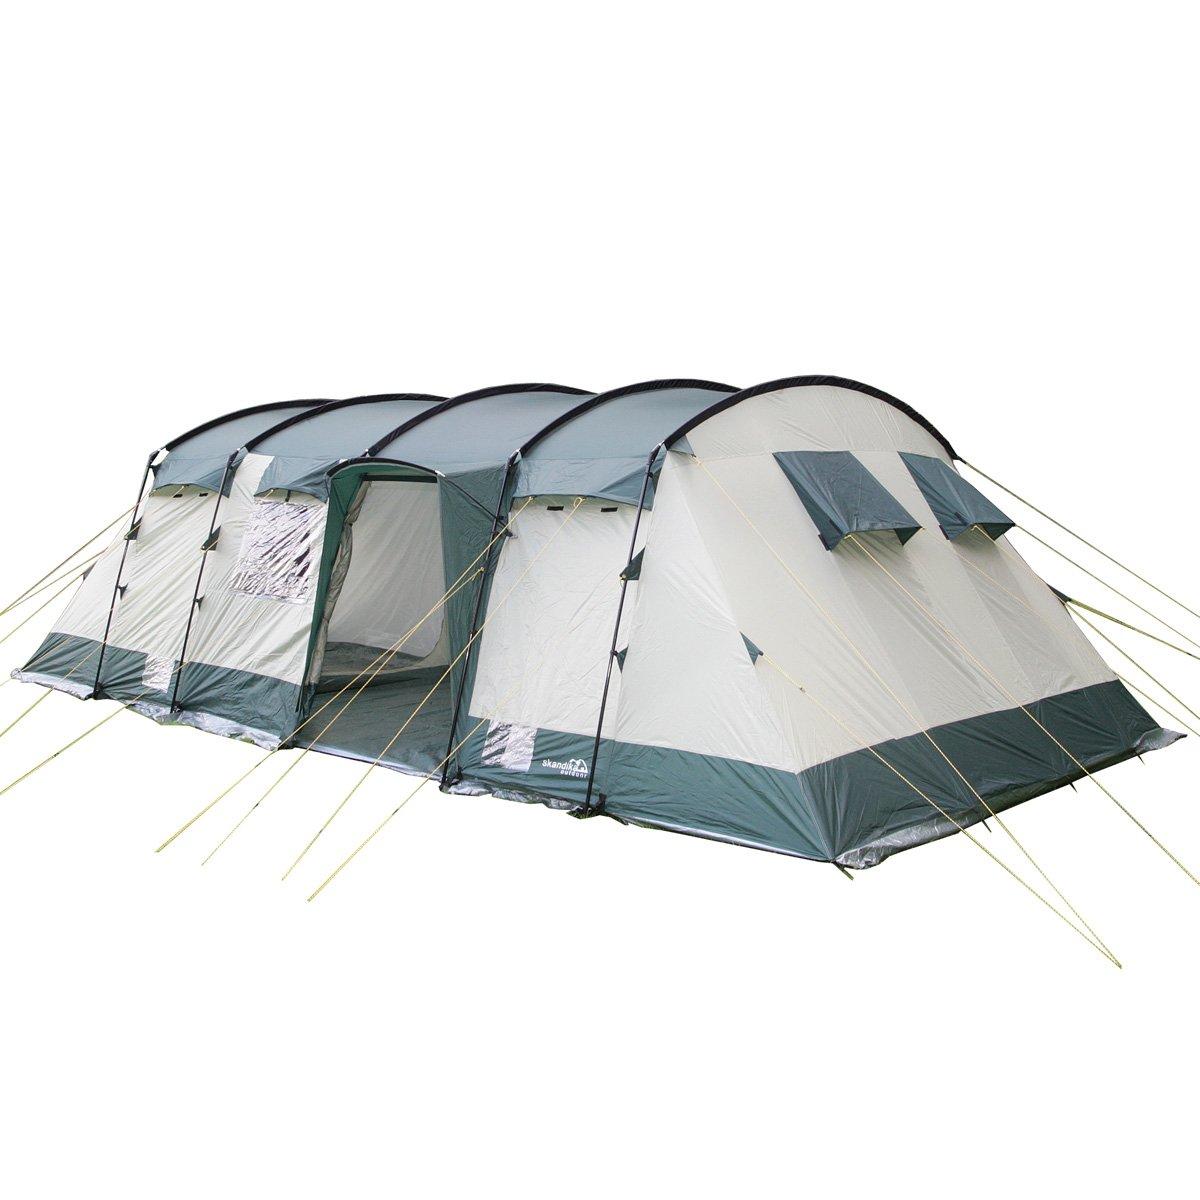 SKANDIKA Hurricane 12 - Tente de Camping familiale Tunnel - 12 Personnes - 700x405 cm product image